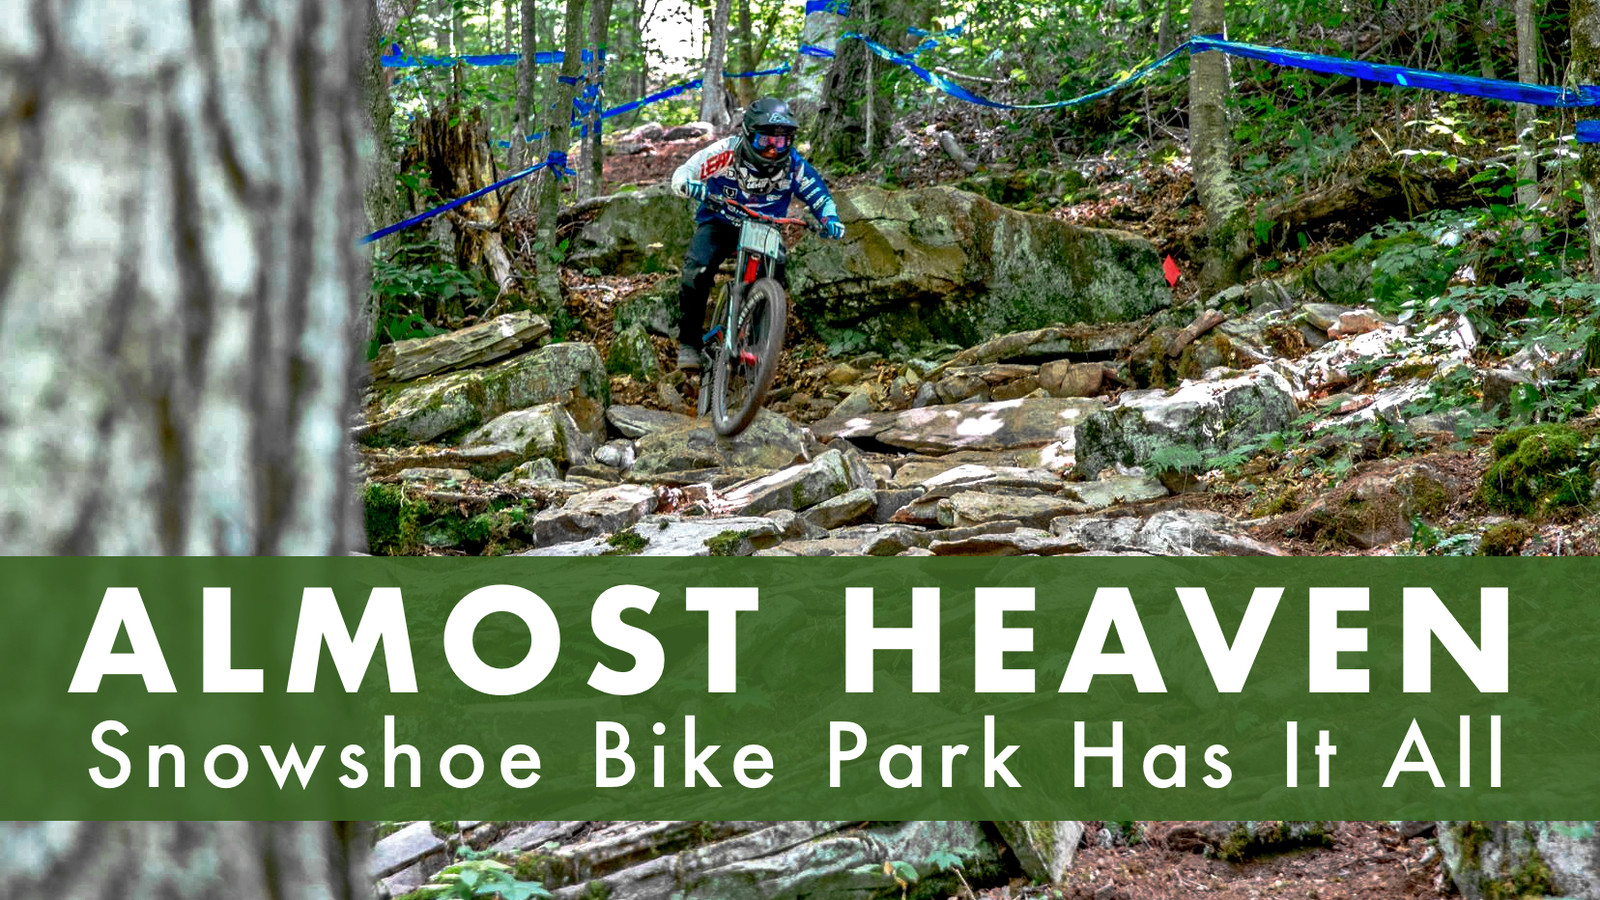 Almost Heaven - Snowshoe Bike Park Has It All